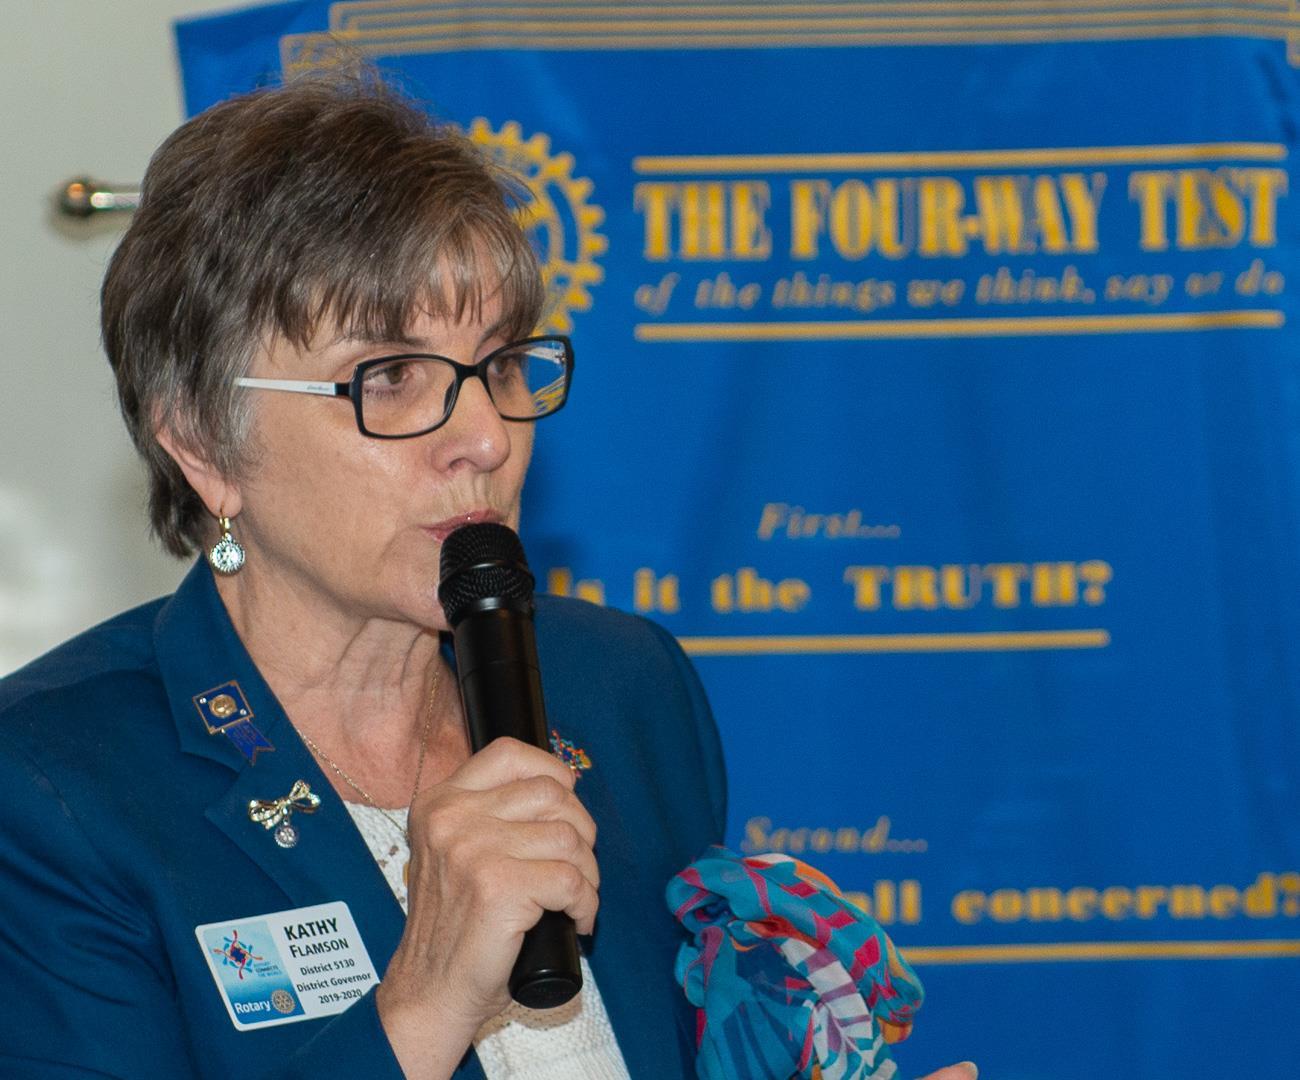 DG Kathy Flamson